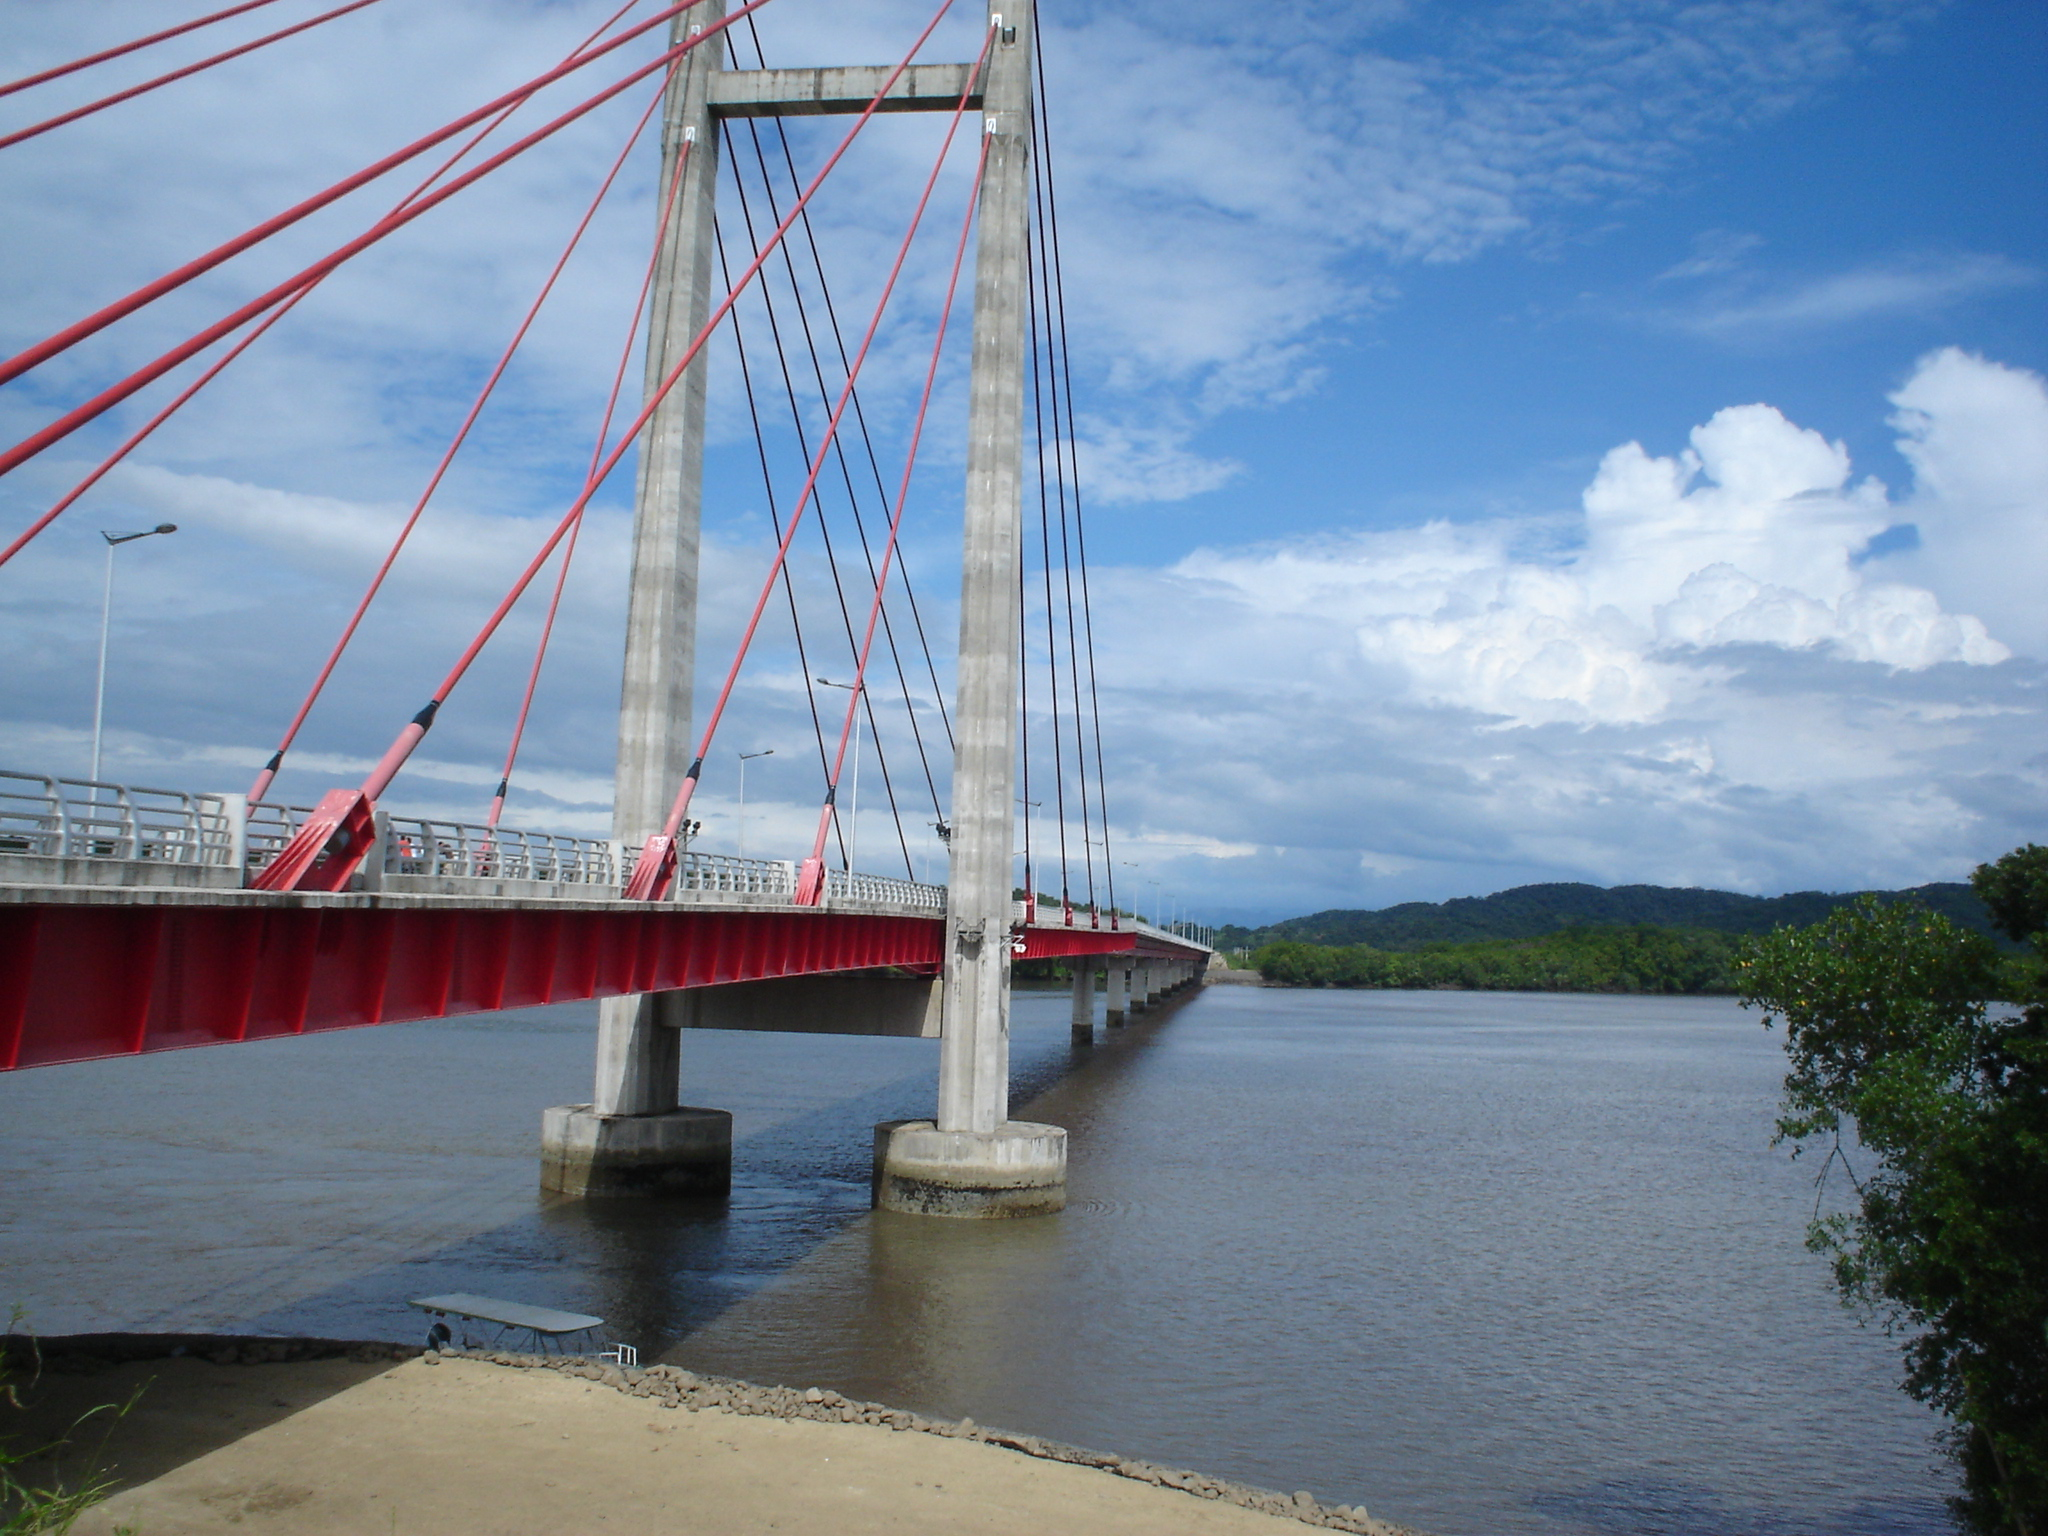 pont liberia amistad costa rica voyage